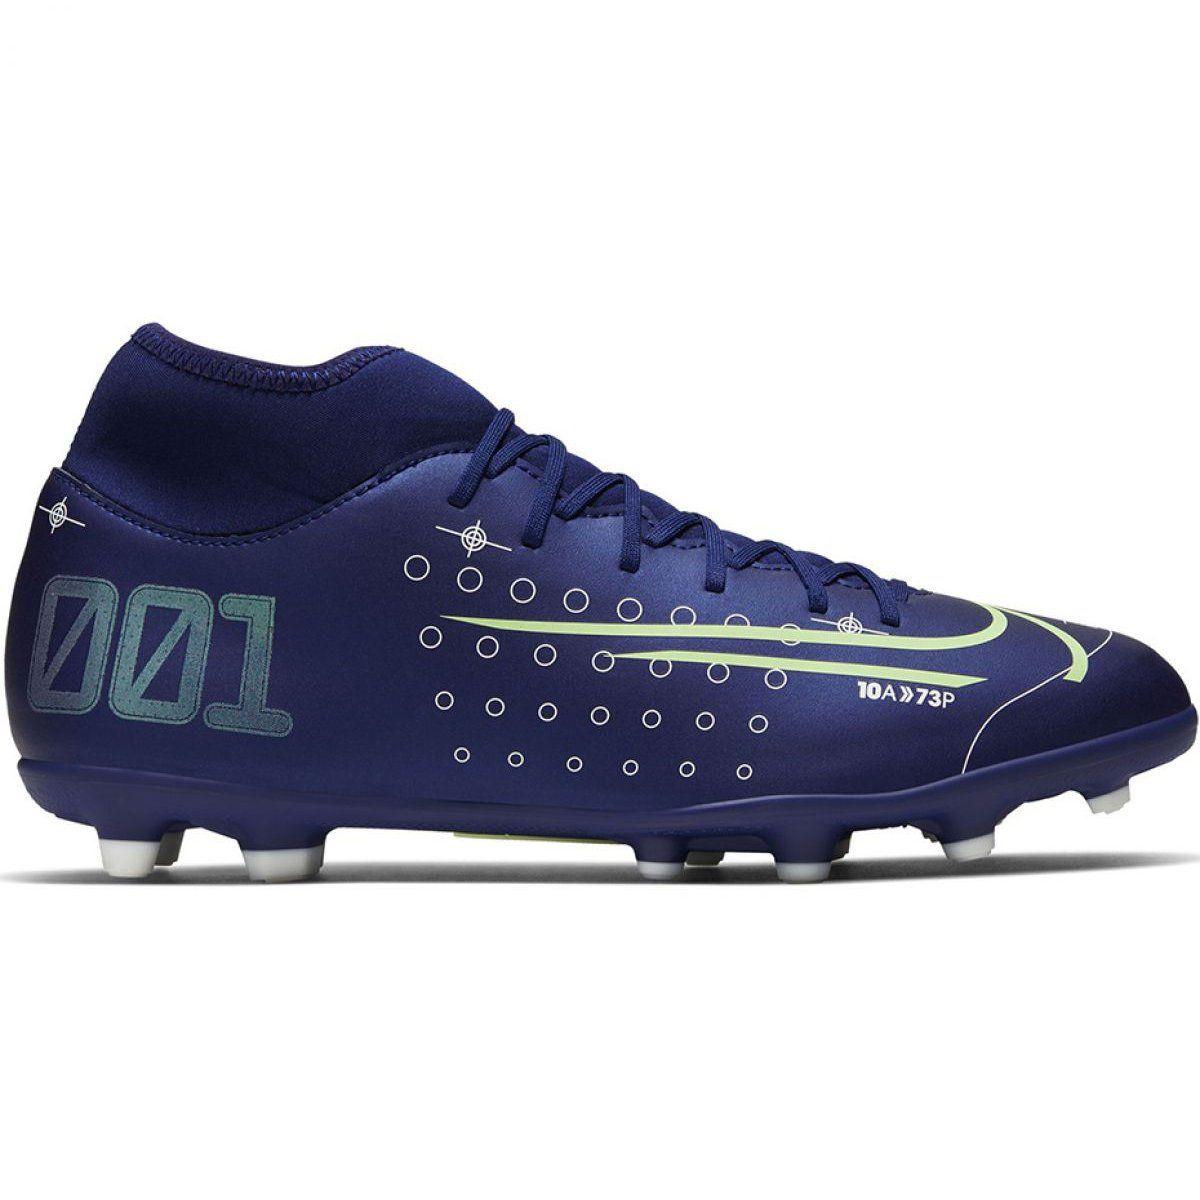 Buty Pilkarskie Nike Mercurial Superfly 7 Club Mds Fg Mg M Bq5463 401 Granatowe Niebieskie Nike Football Boots Football Boots Nike Soccer Shoes